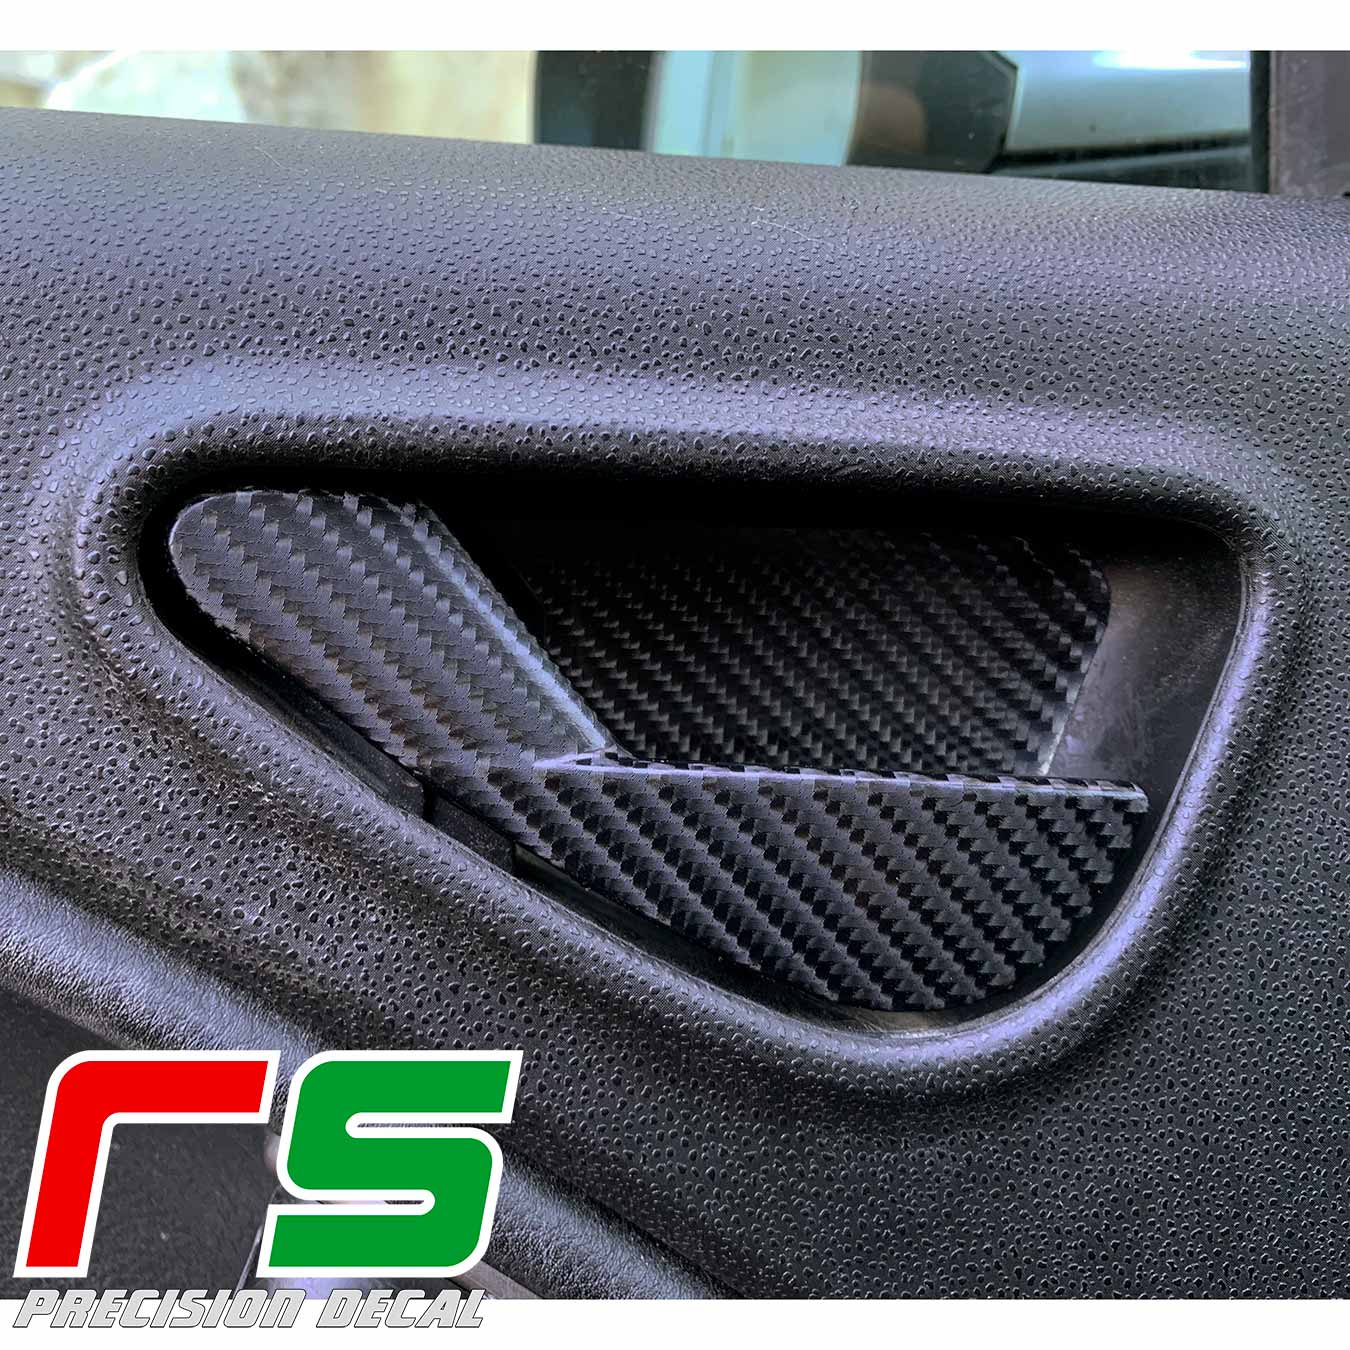 Alfa Romeo Mito autocollants autocollant autocollant leviers poignée tuning carbonlook